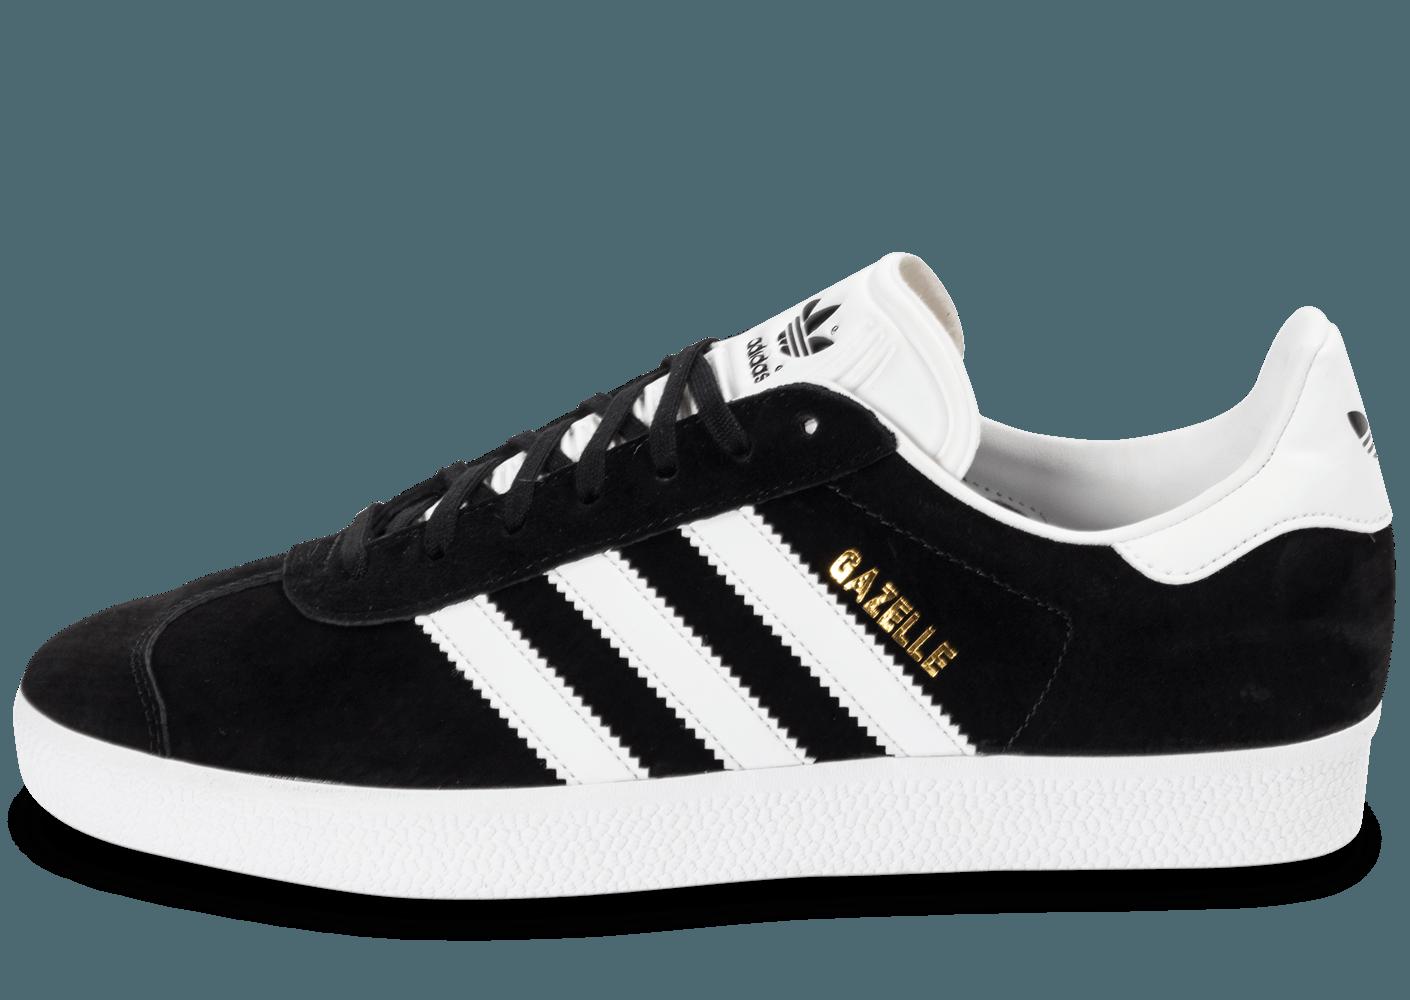 adidas gazelle noir et blanc,Chaussure Gazelle noir BB5476